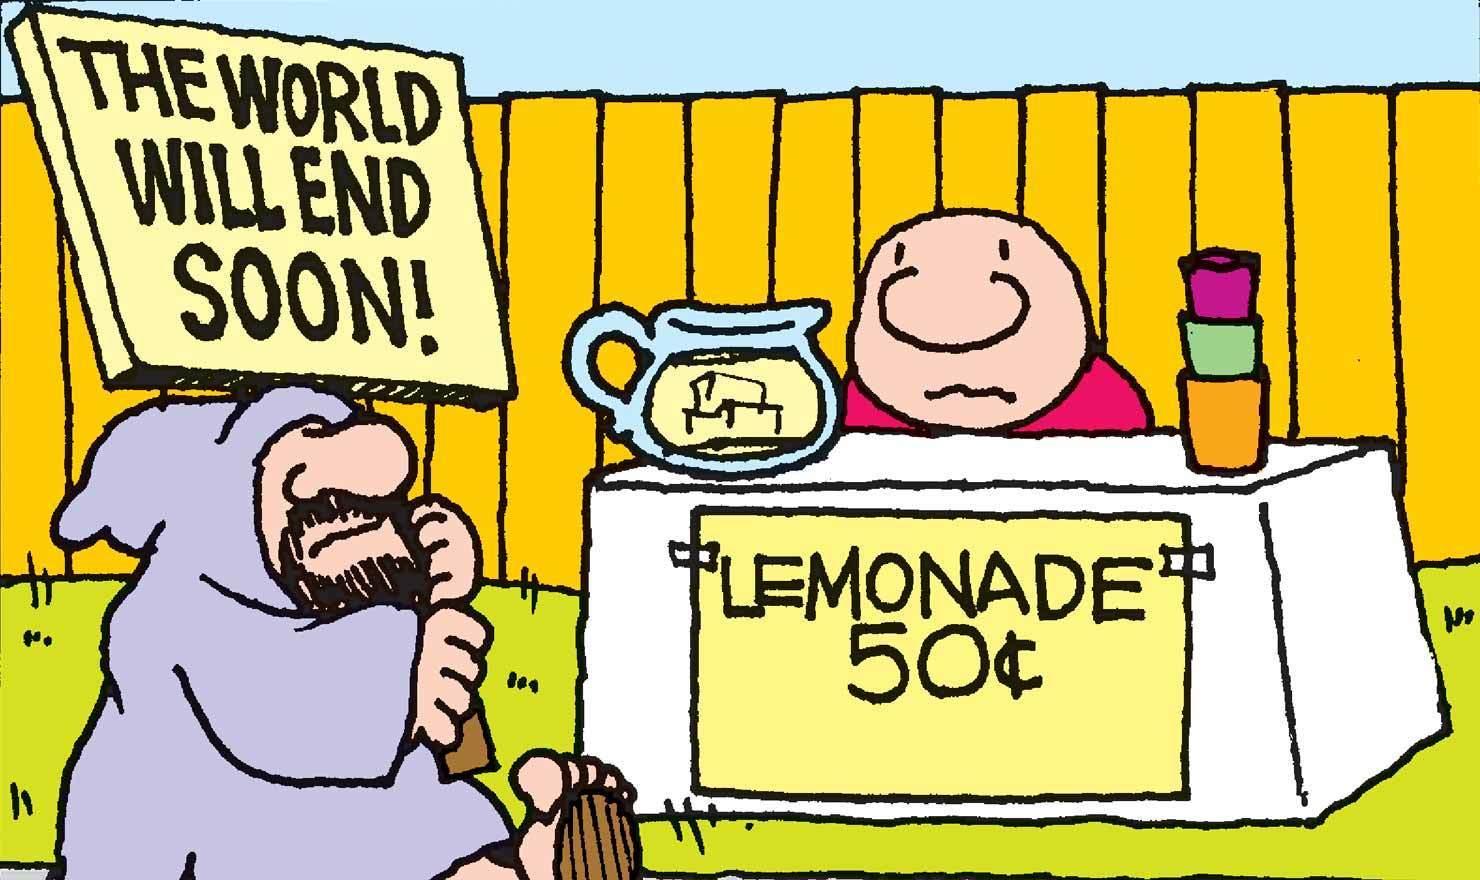 12 Sweetly Sour Comics For Lemonade Day